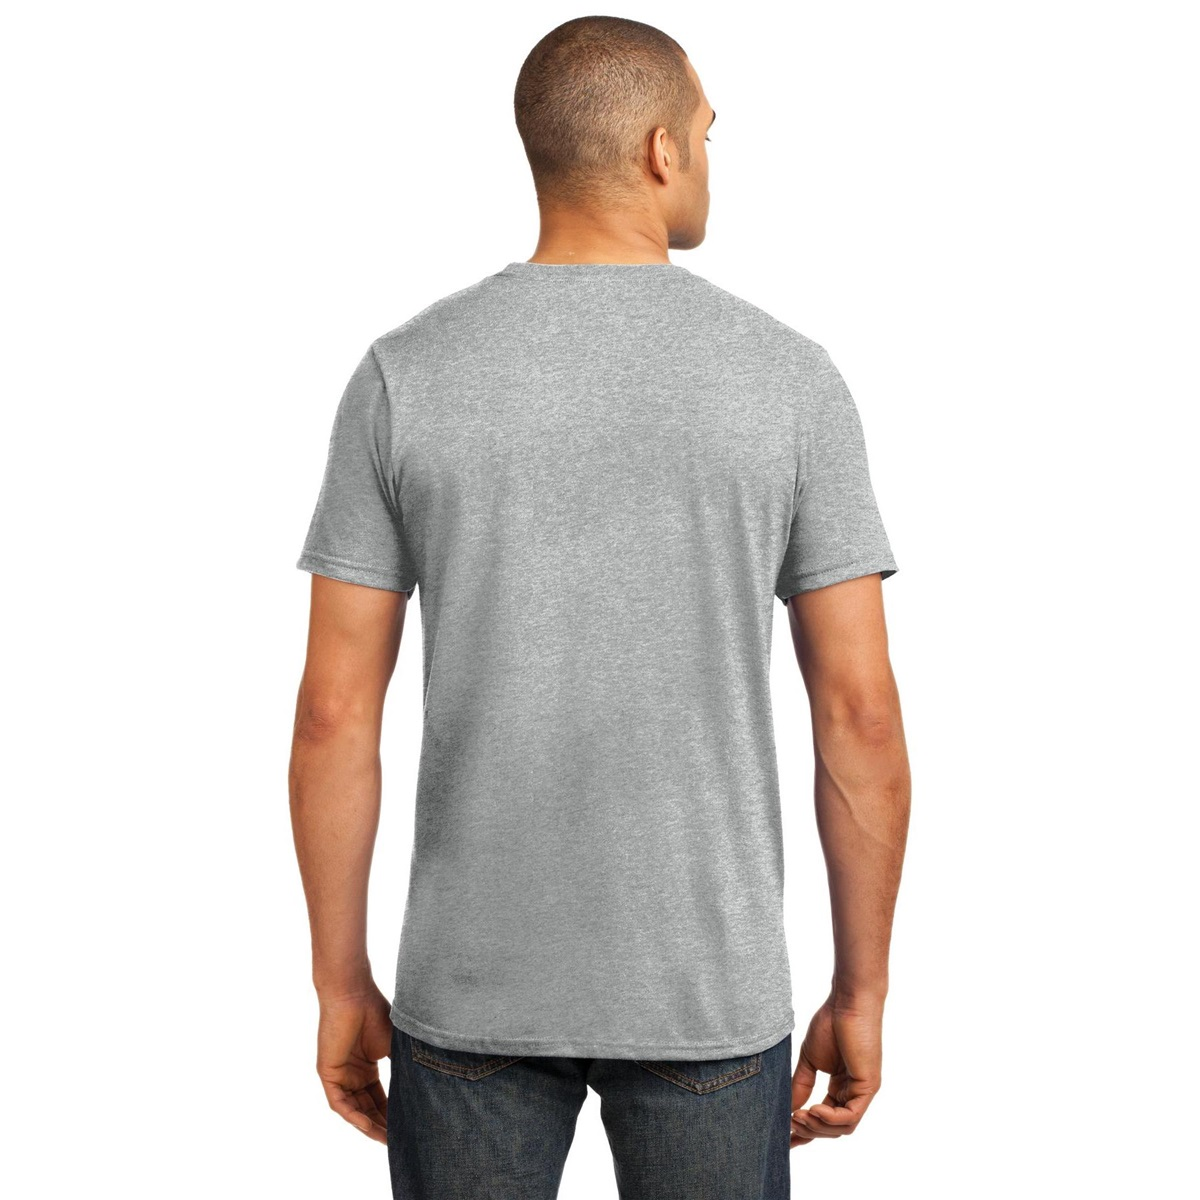 Anvil 980 Ring Spun Cotton T Shirt Heather Grey